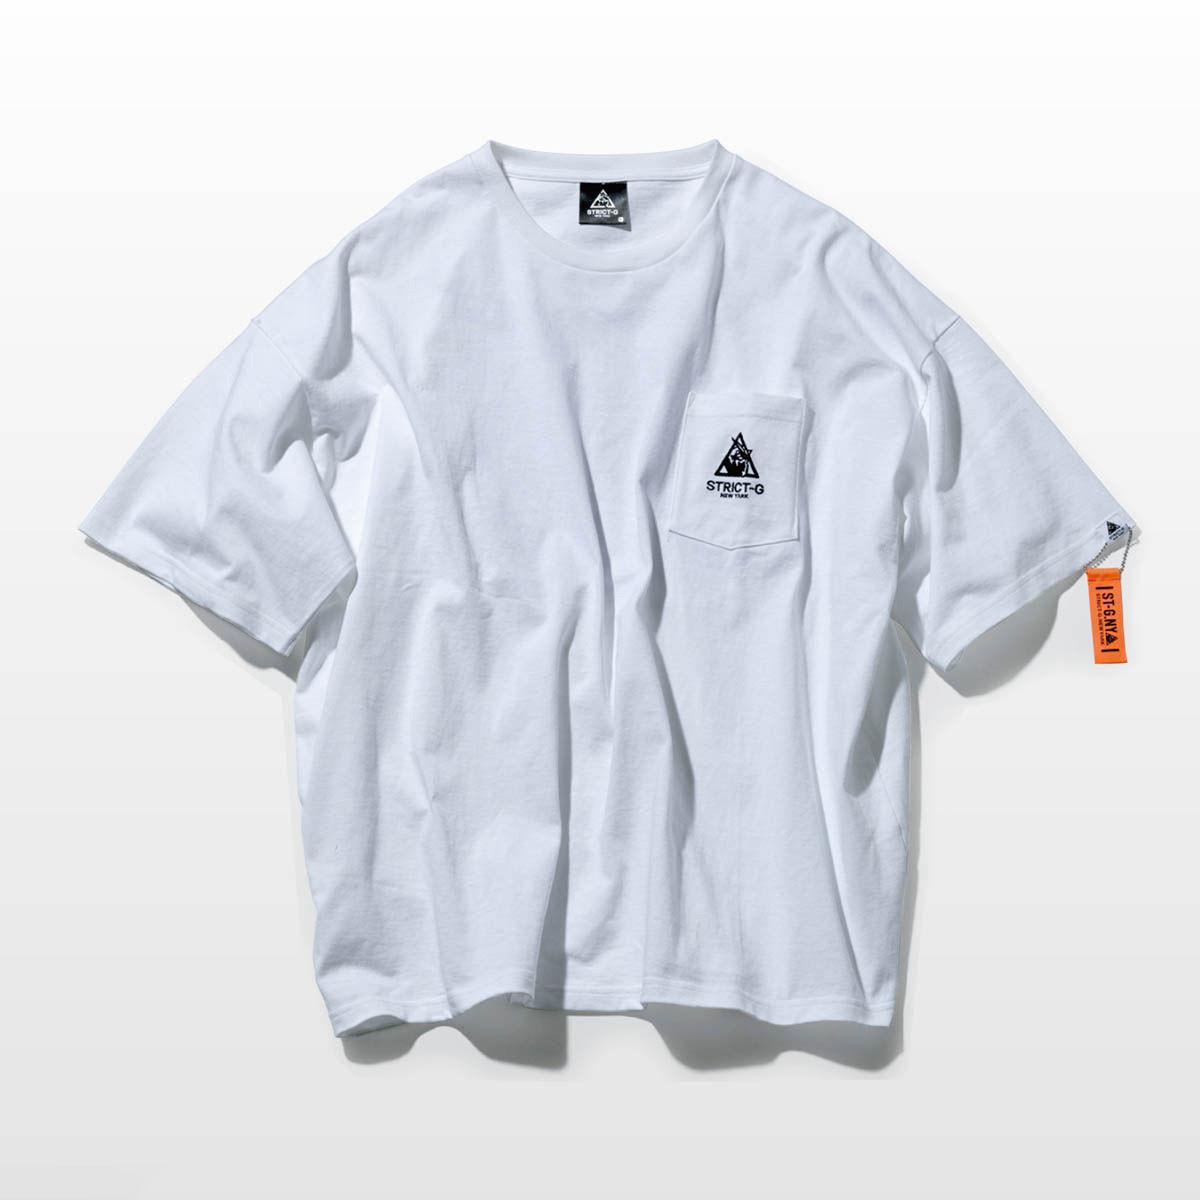 STRICT-G NEW YARK Gundam Oversized T-shirt